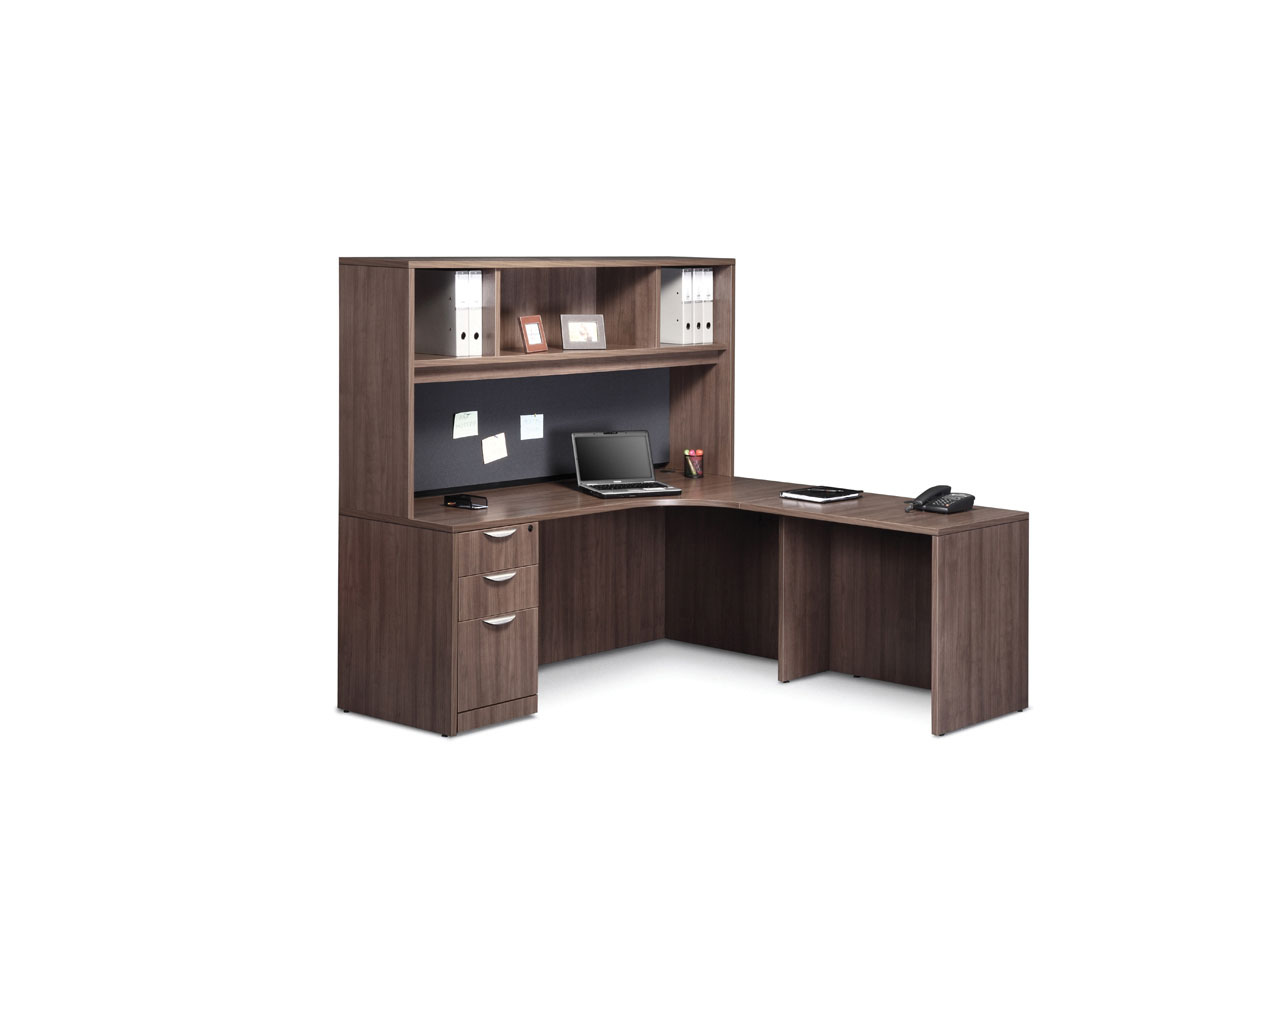 Classic L-Shaped Corner Desk with Full Box/Box/File Pedestal and Optional Hutch